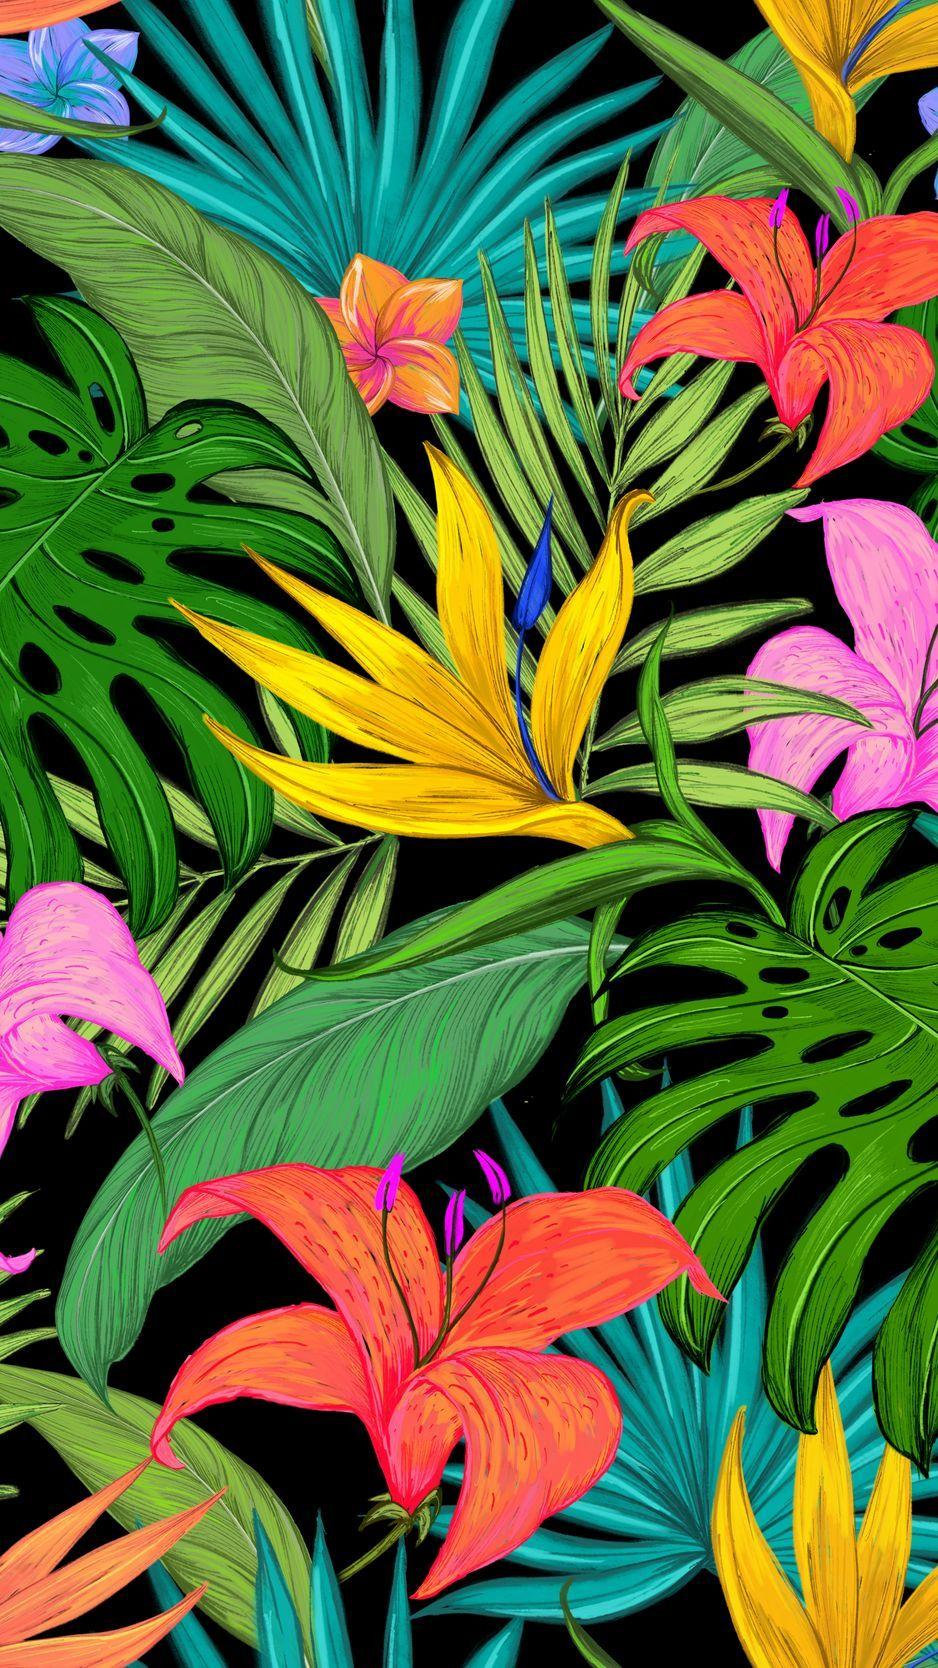 Tropical Leaves Iphone Wallpaper : tropical, leaves, iphone, wallpaper, Tropical, Leaves, Phone, Wallpapers, Wallpaper